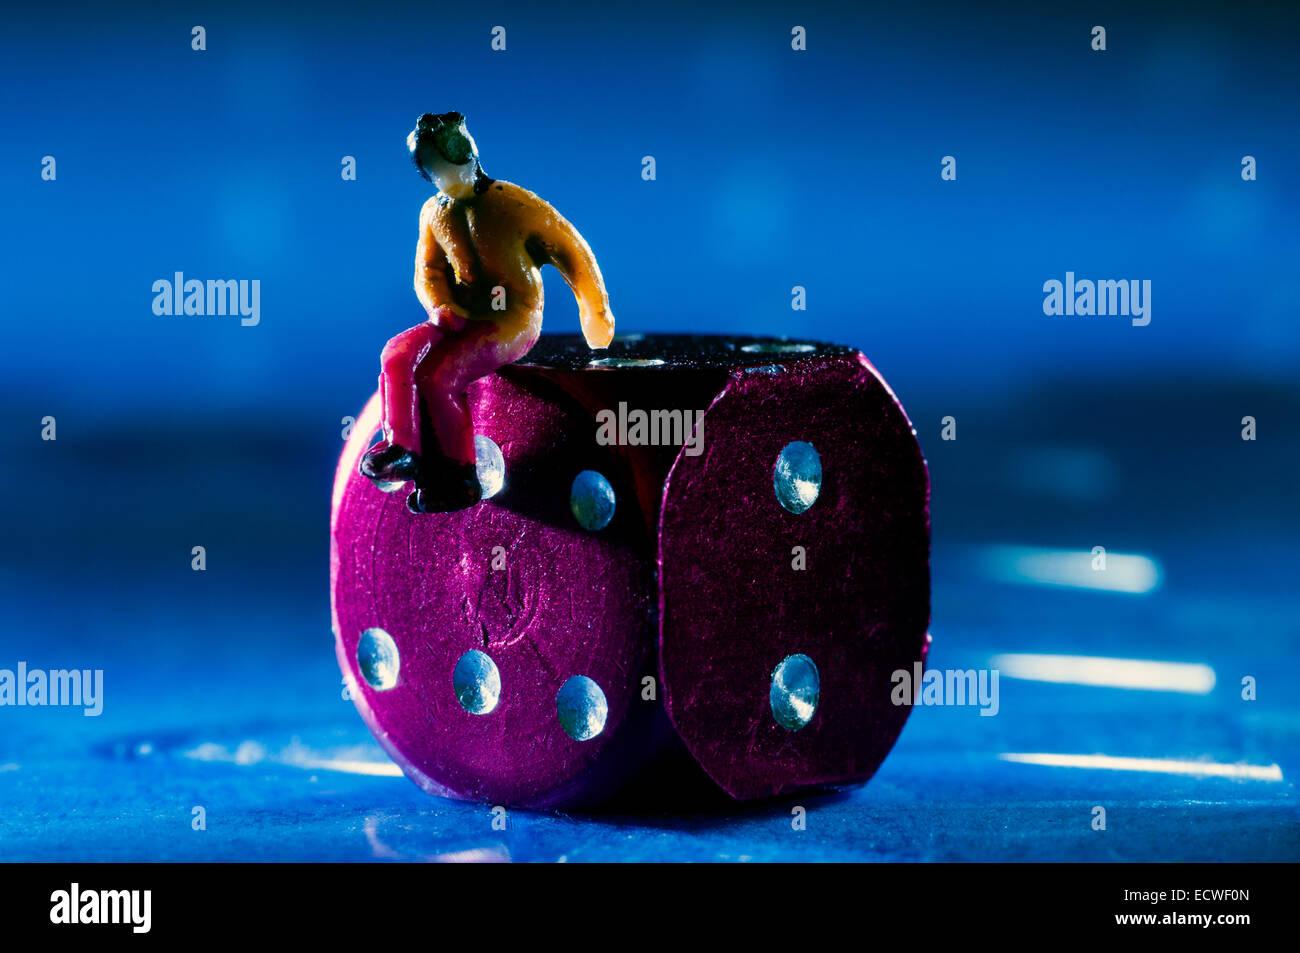 Dice with mini figure in studio setting - Stock Image